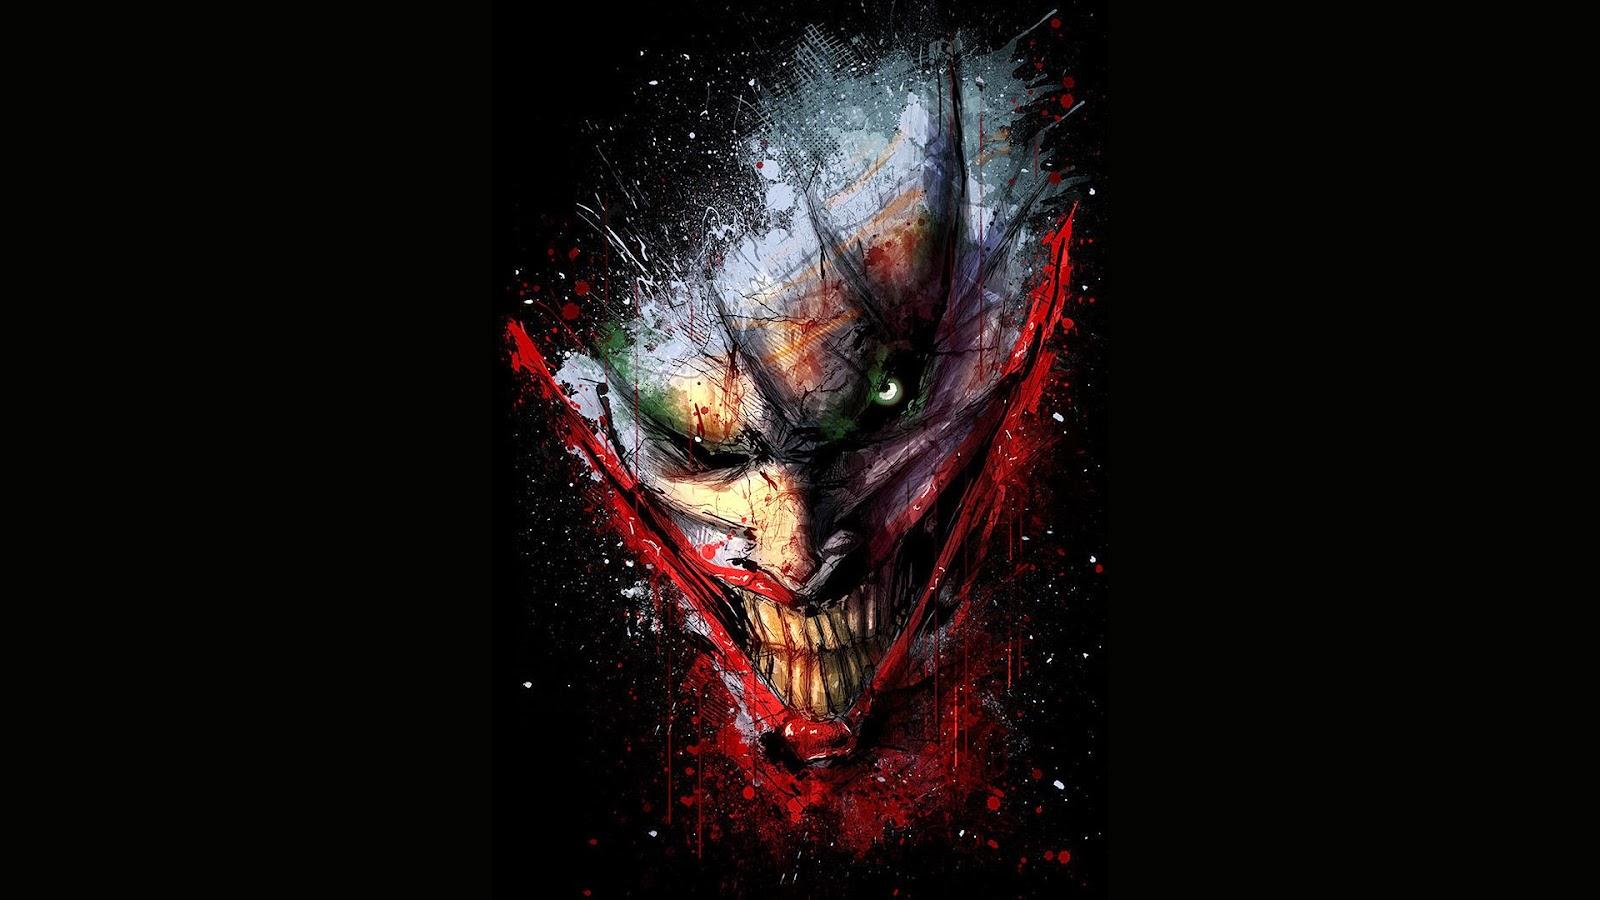 43 ] Joker 3D Wallpaper On WallpaperSafari